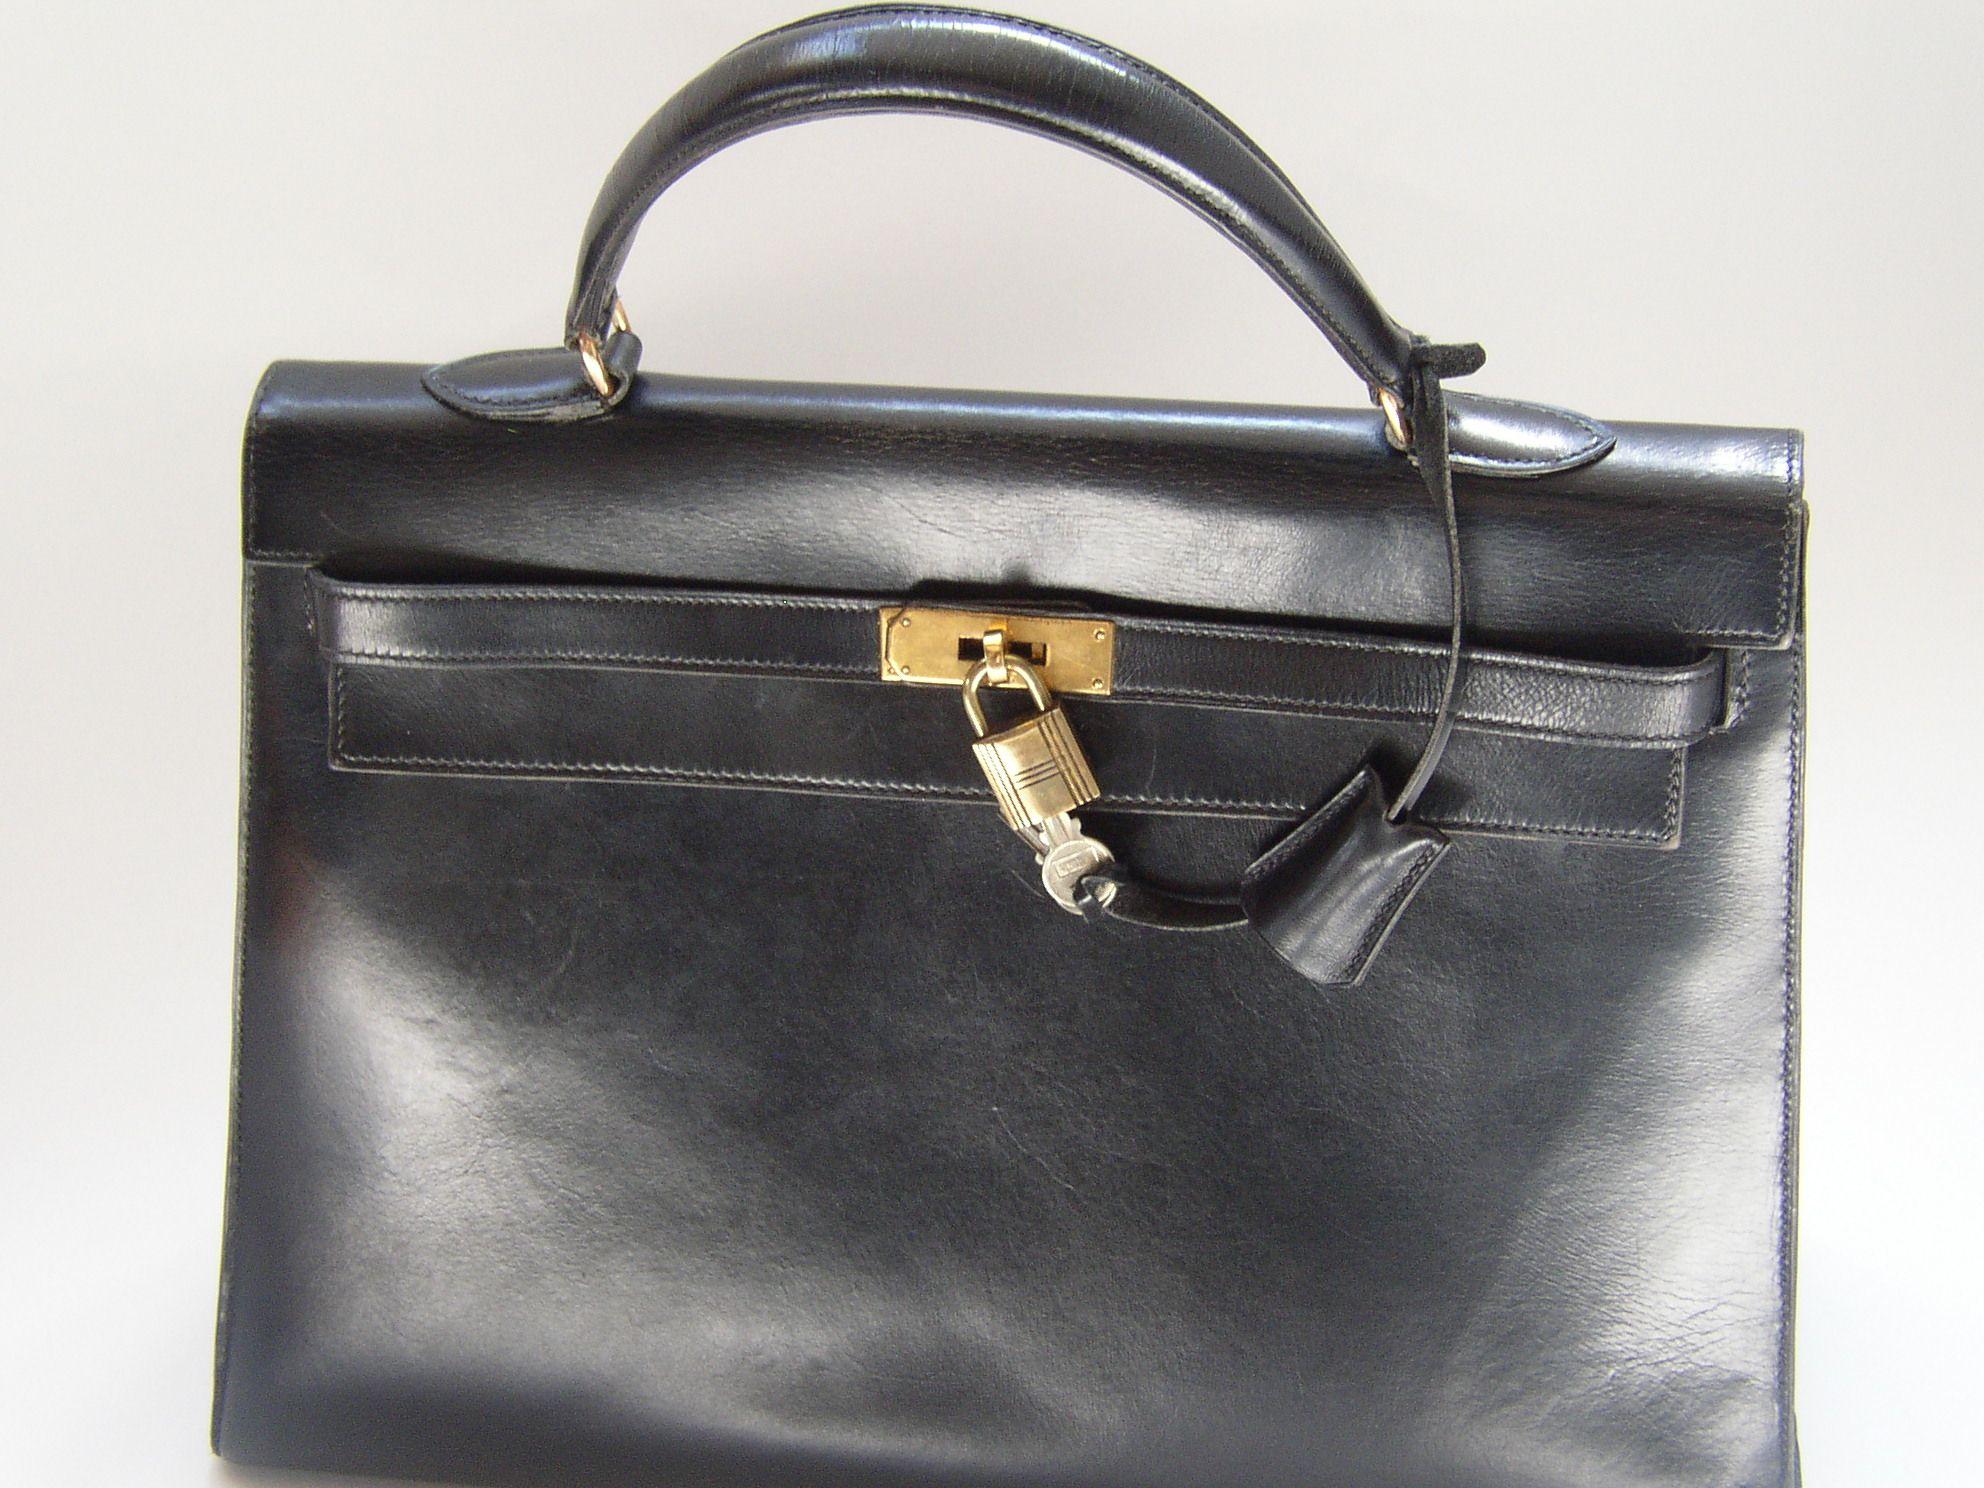 7fb96a2e4d Kelly bag by Hermès | Tasteful Objects - TOINC.